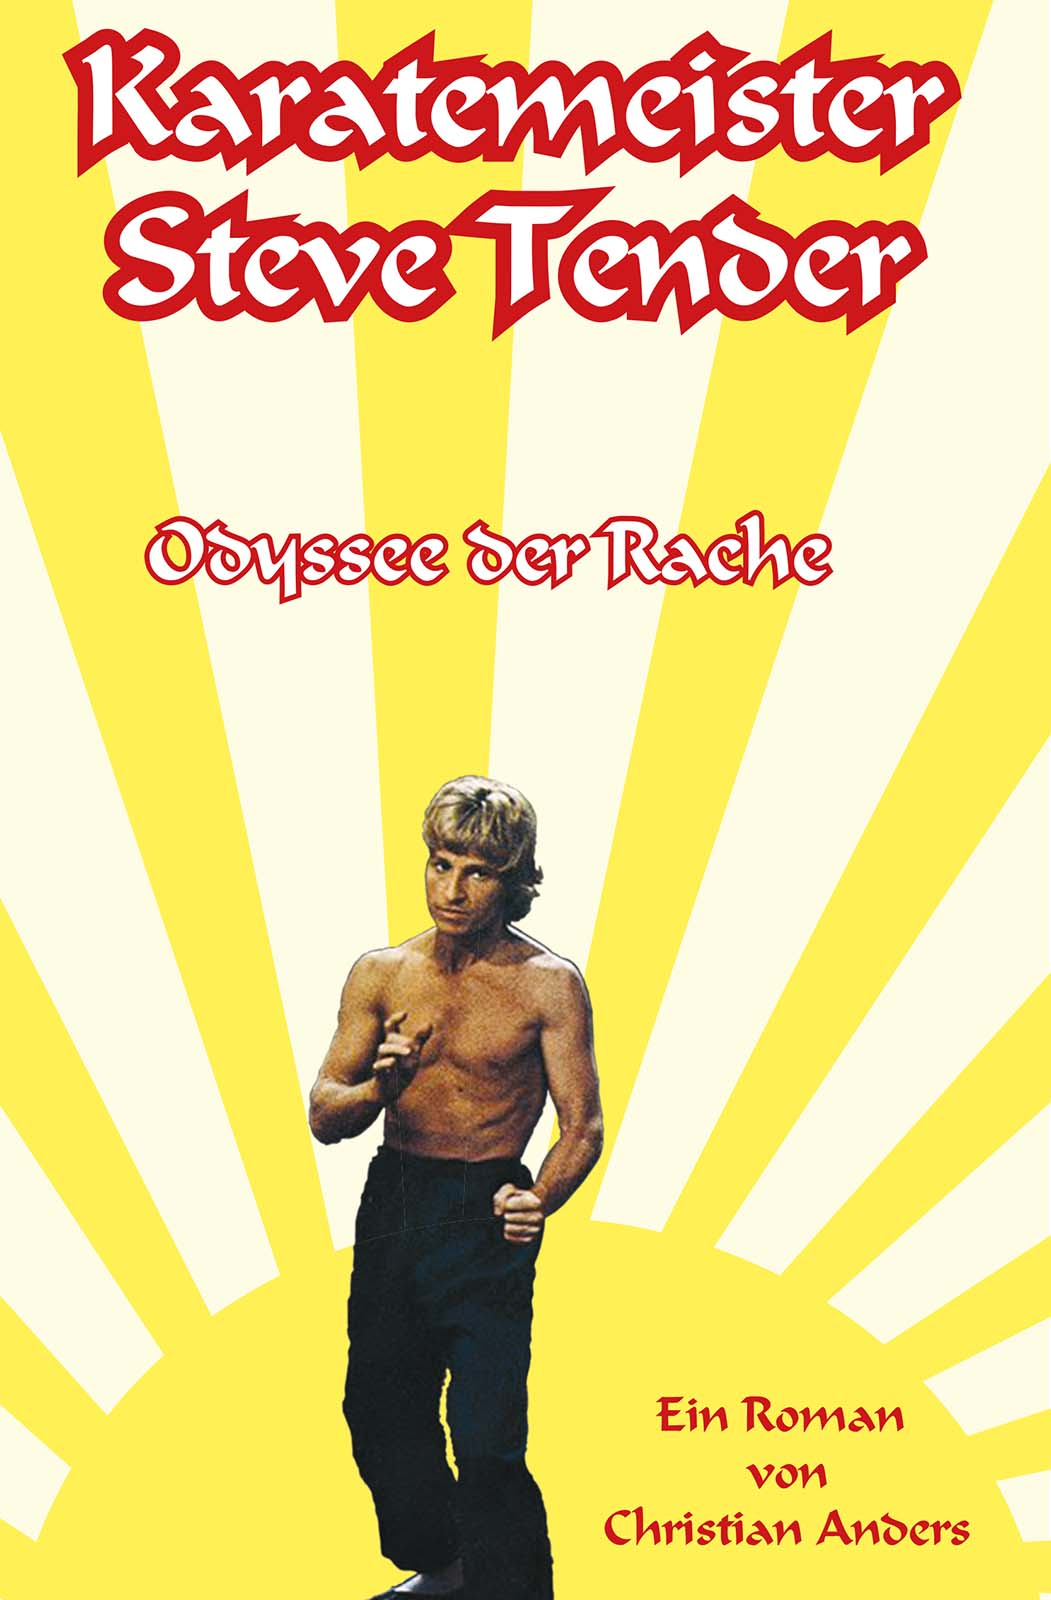 karatemeister-cover-01.indd